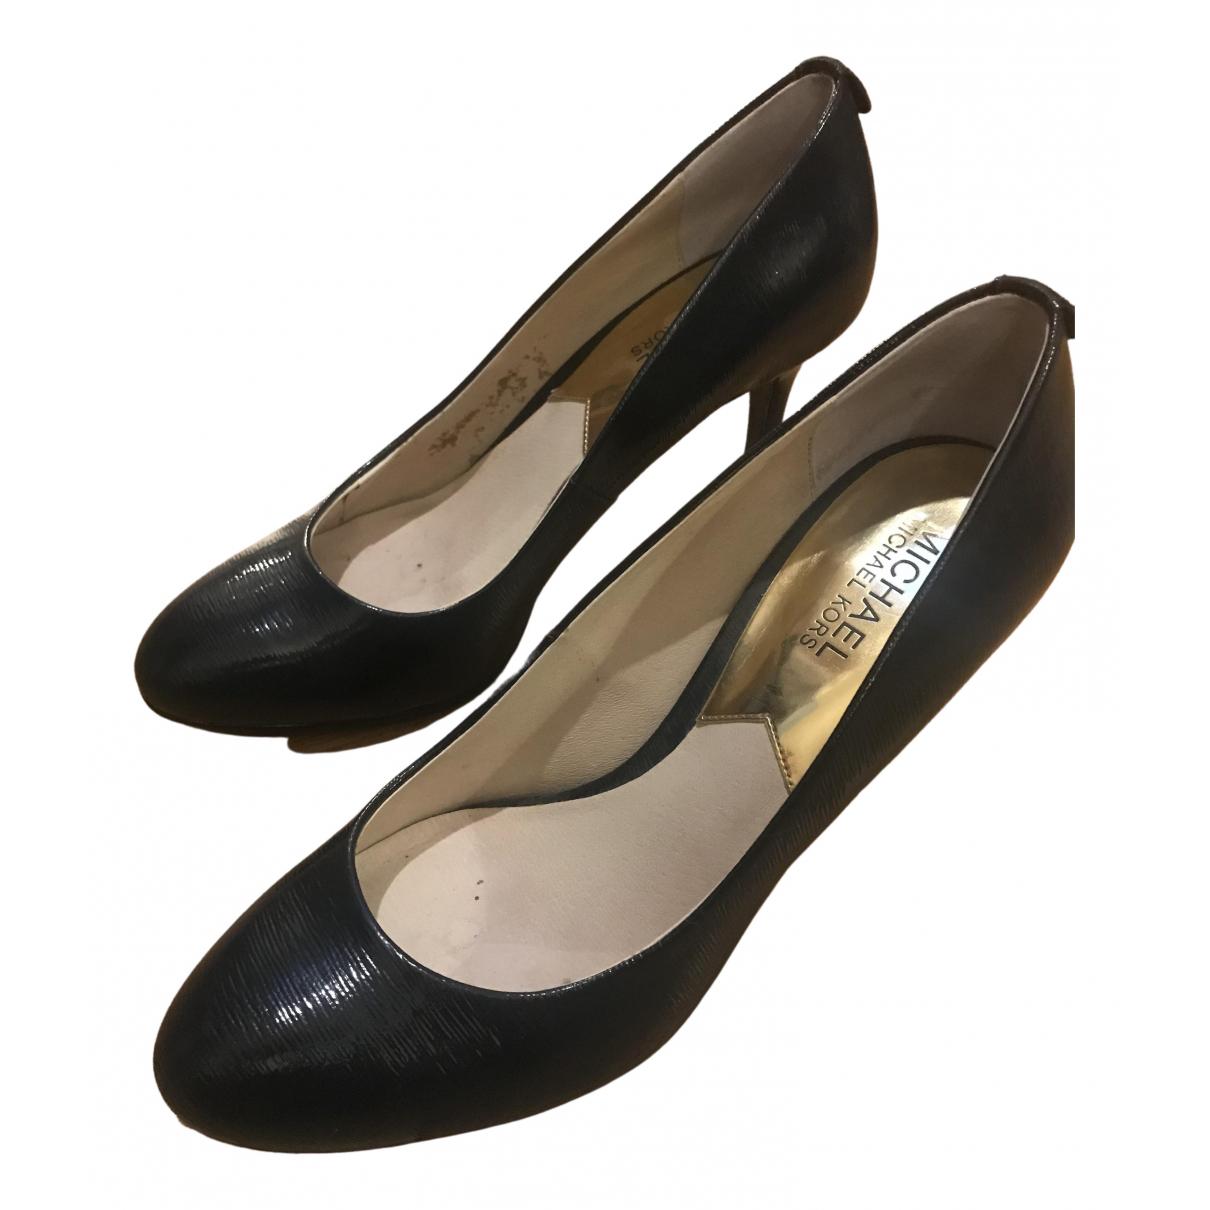 Michael Kors \N Blue Leather Heels for Women 8.5 US